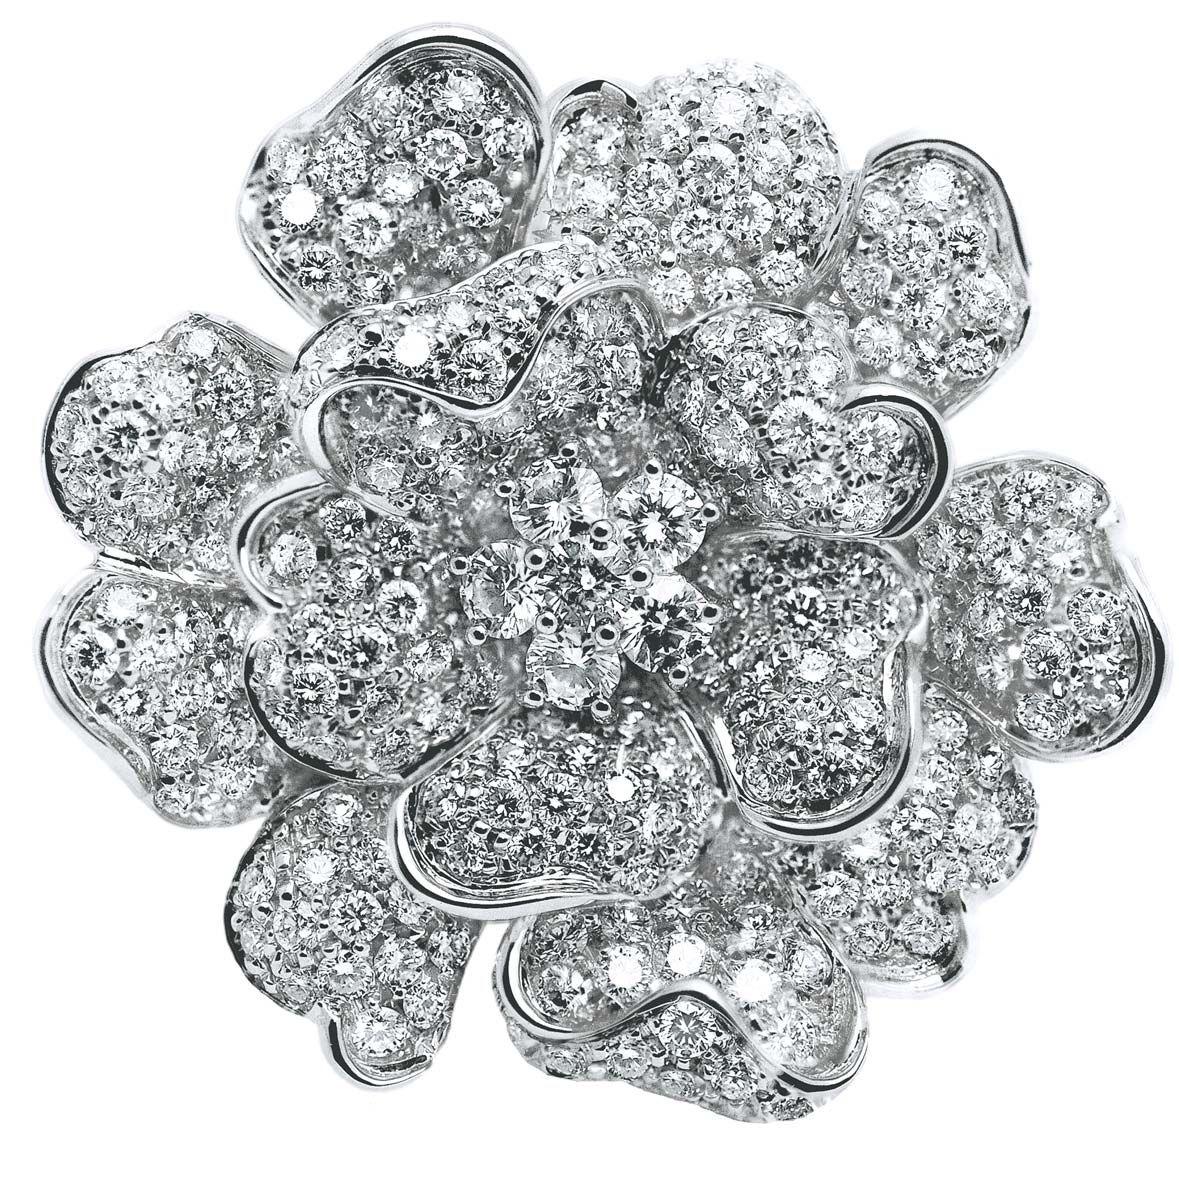 Leo Pizzo anello oro bianco e brillanti http://goo.gl/EFfjOf